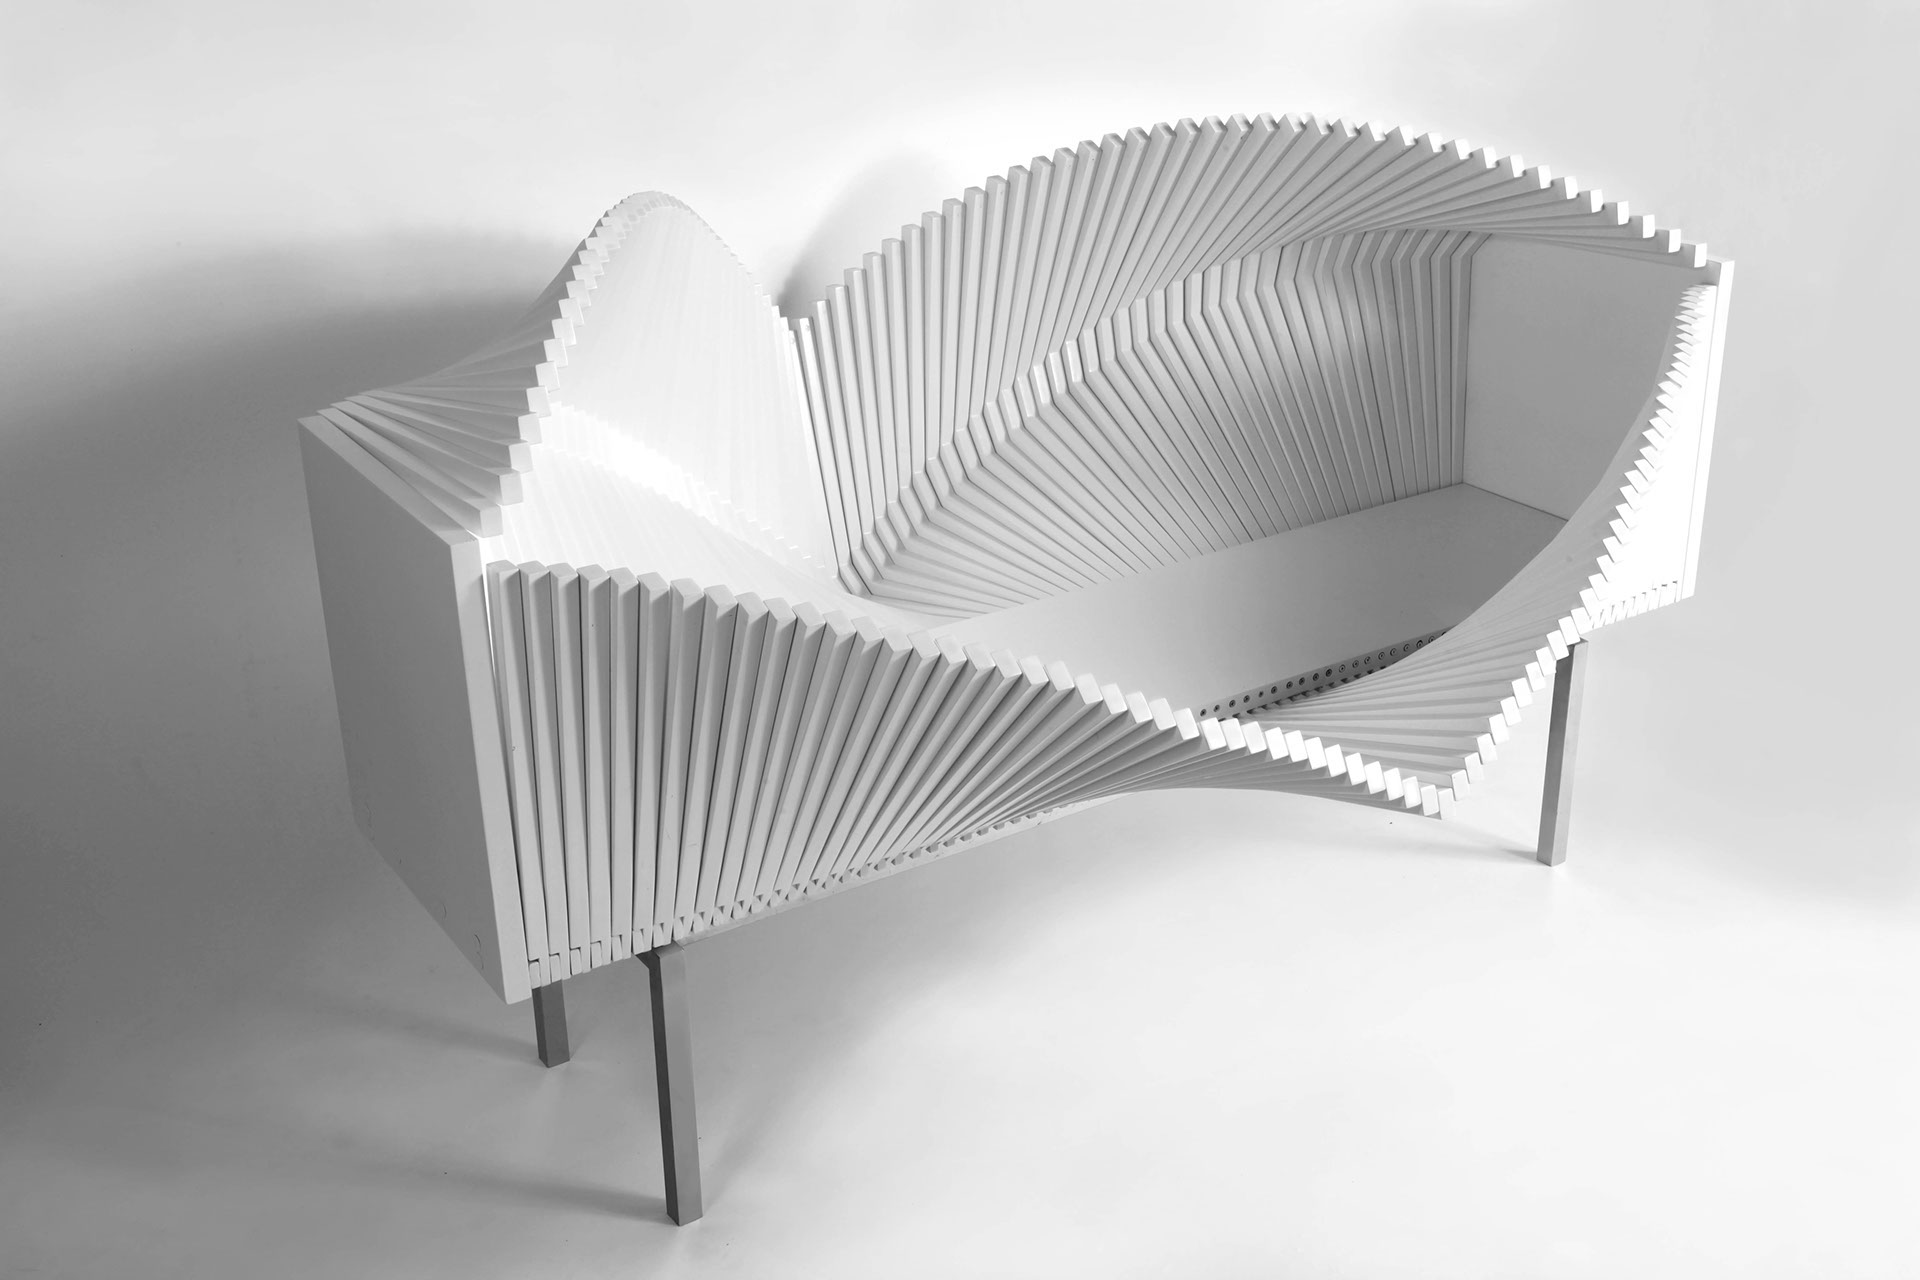 Wave Cabinet by Sebastian Errazuriz